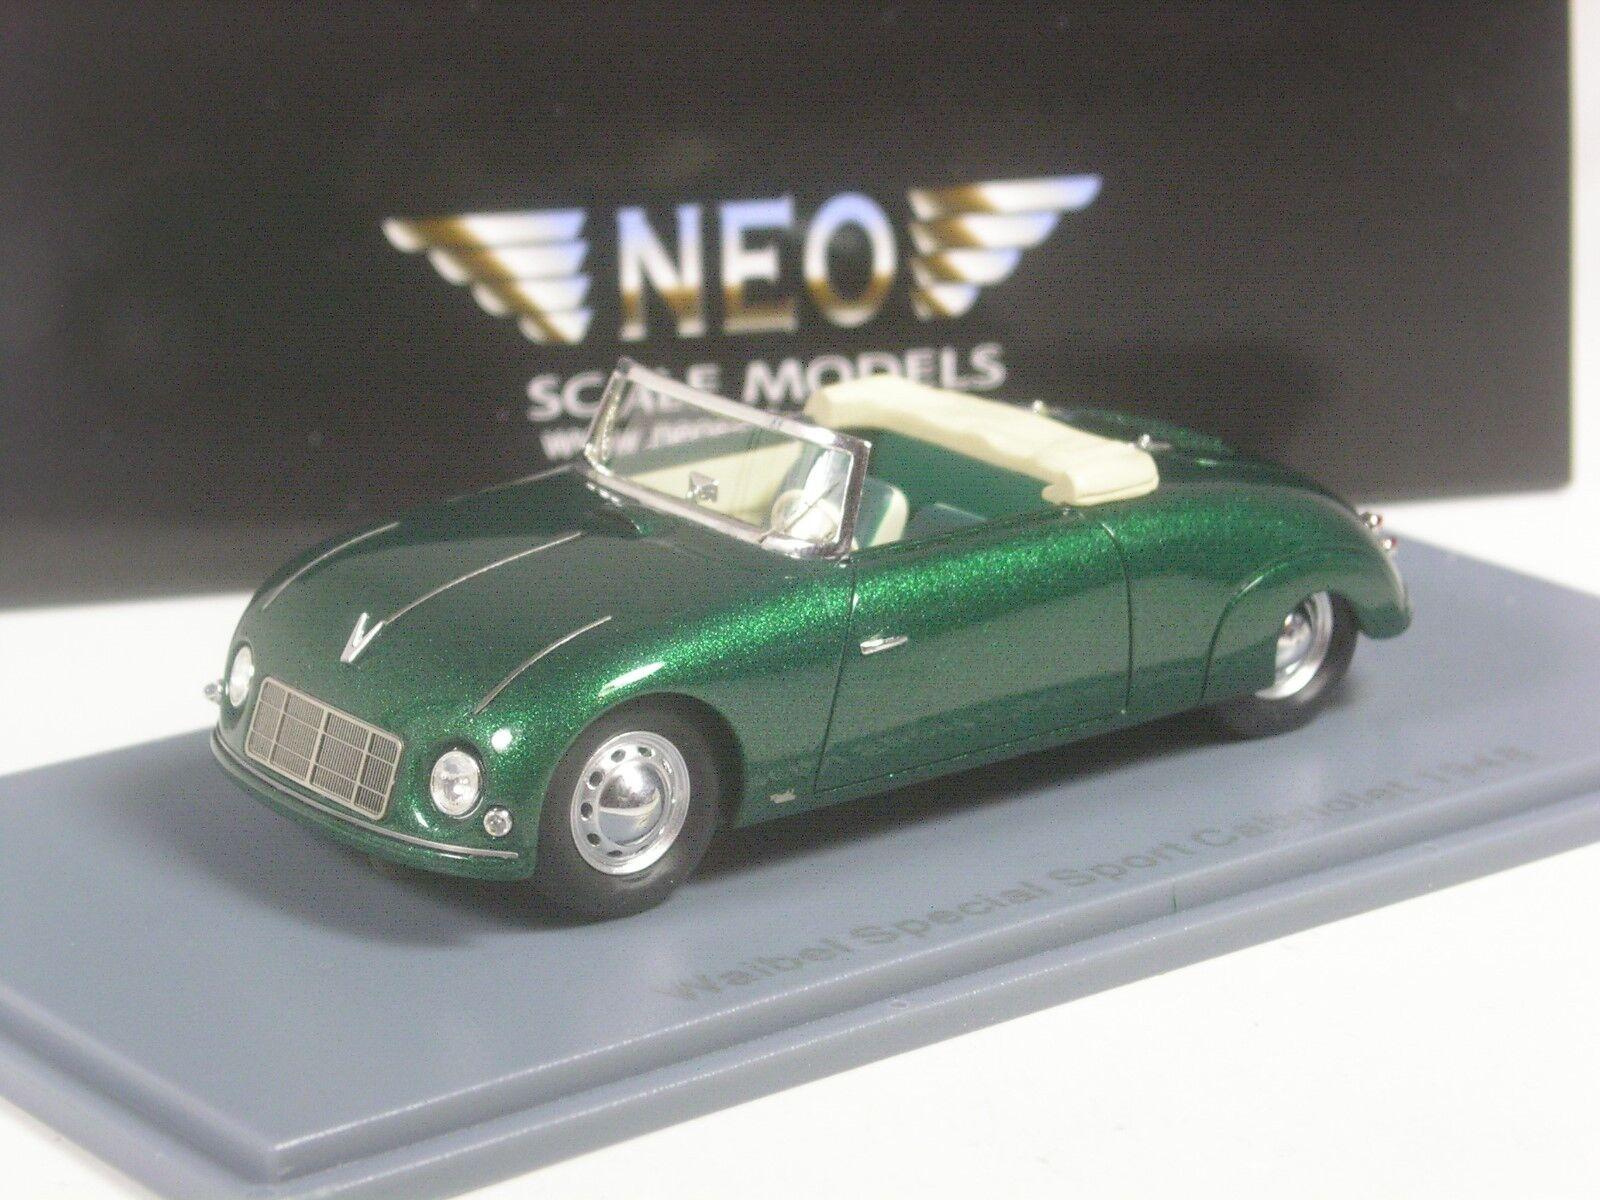 CLASSE  Neo scale models Porsche Porsche Porsche Waibel Cabriolet 1948 vertmetallic en 1 43 dans neuf dans sa boîte f627b8